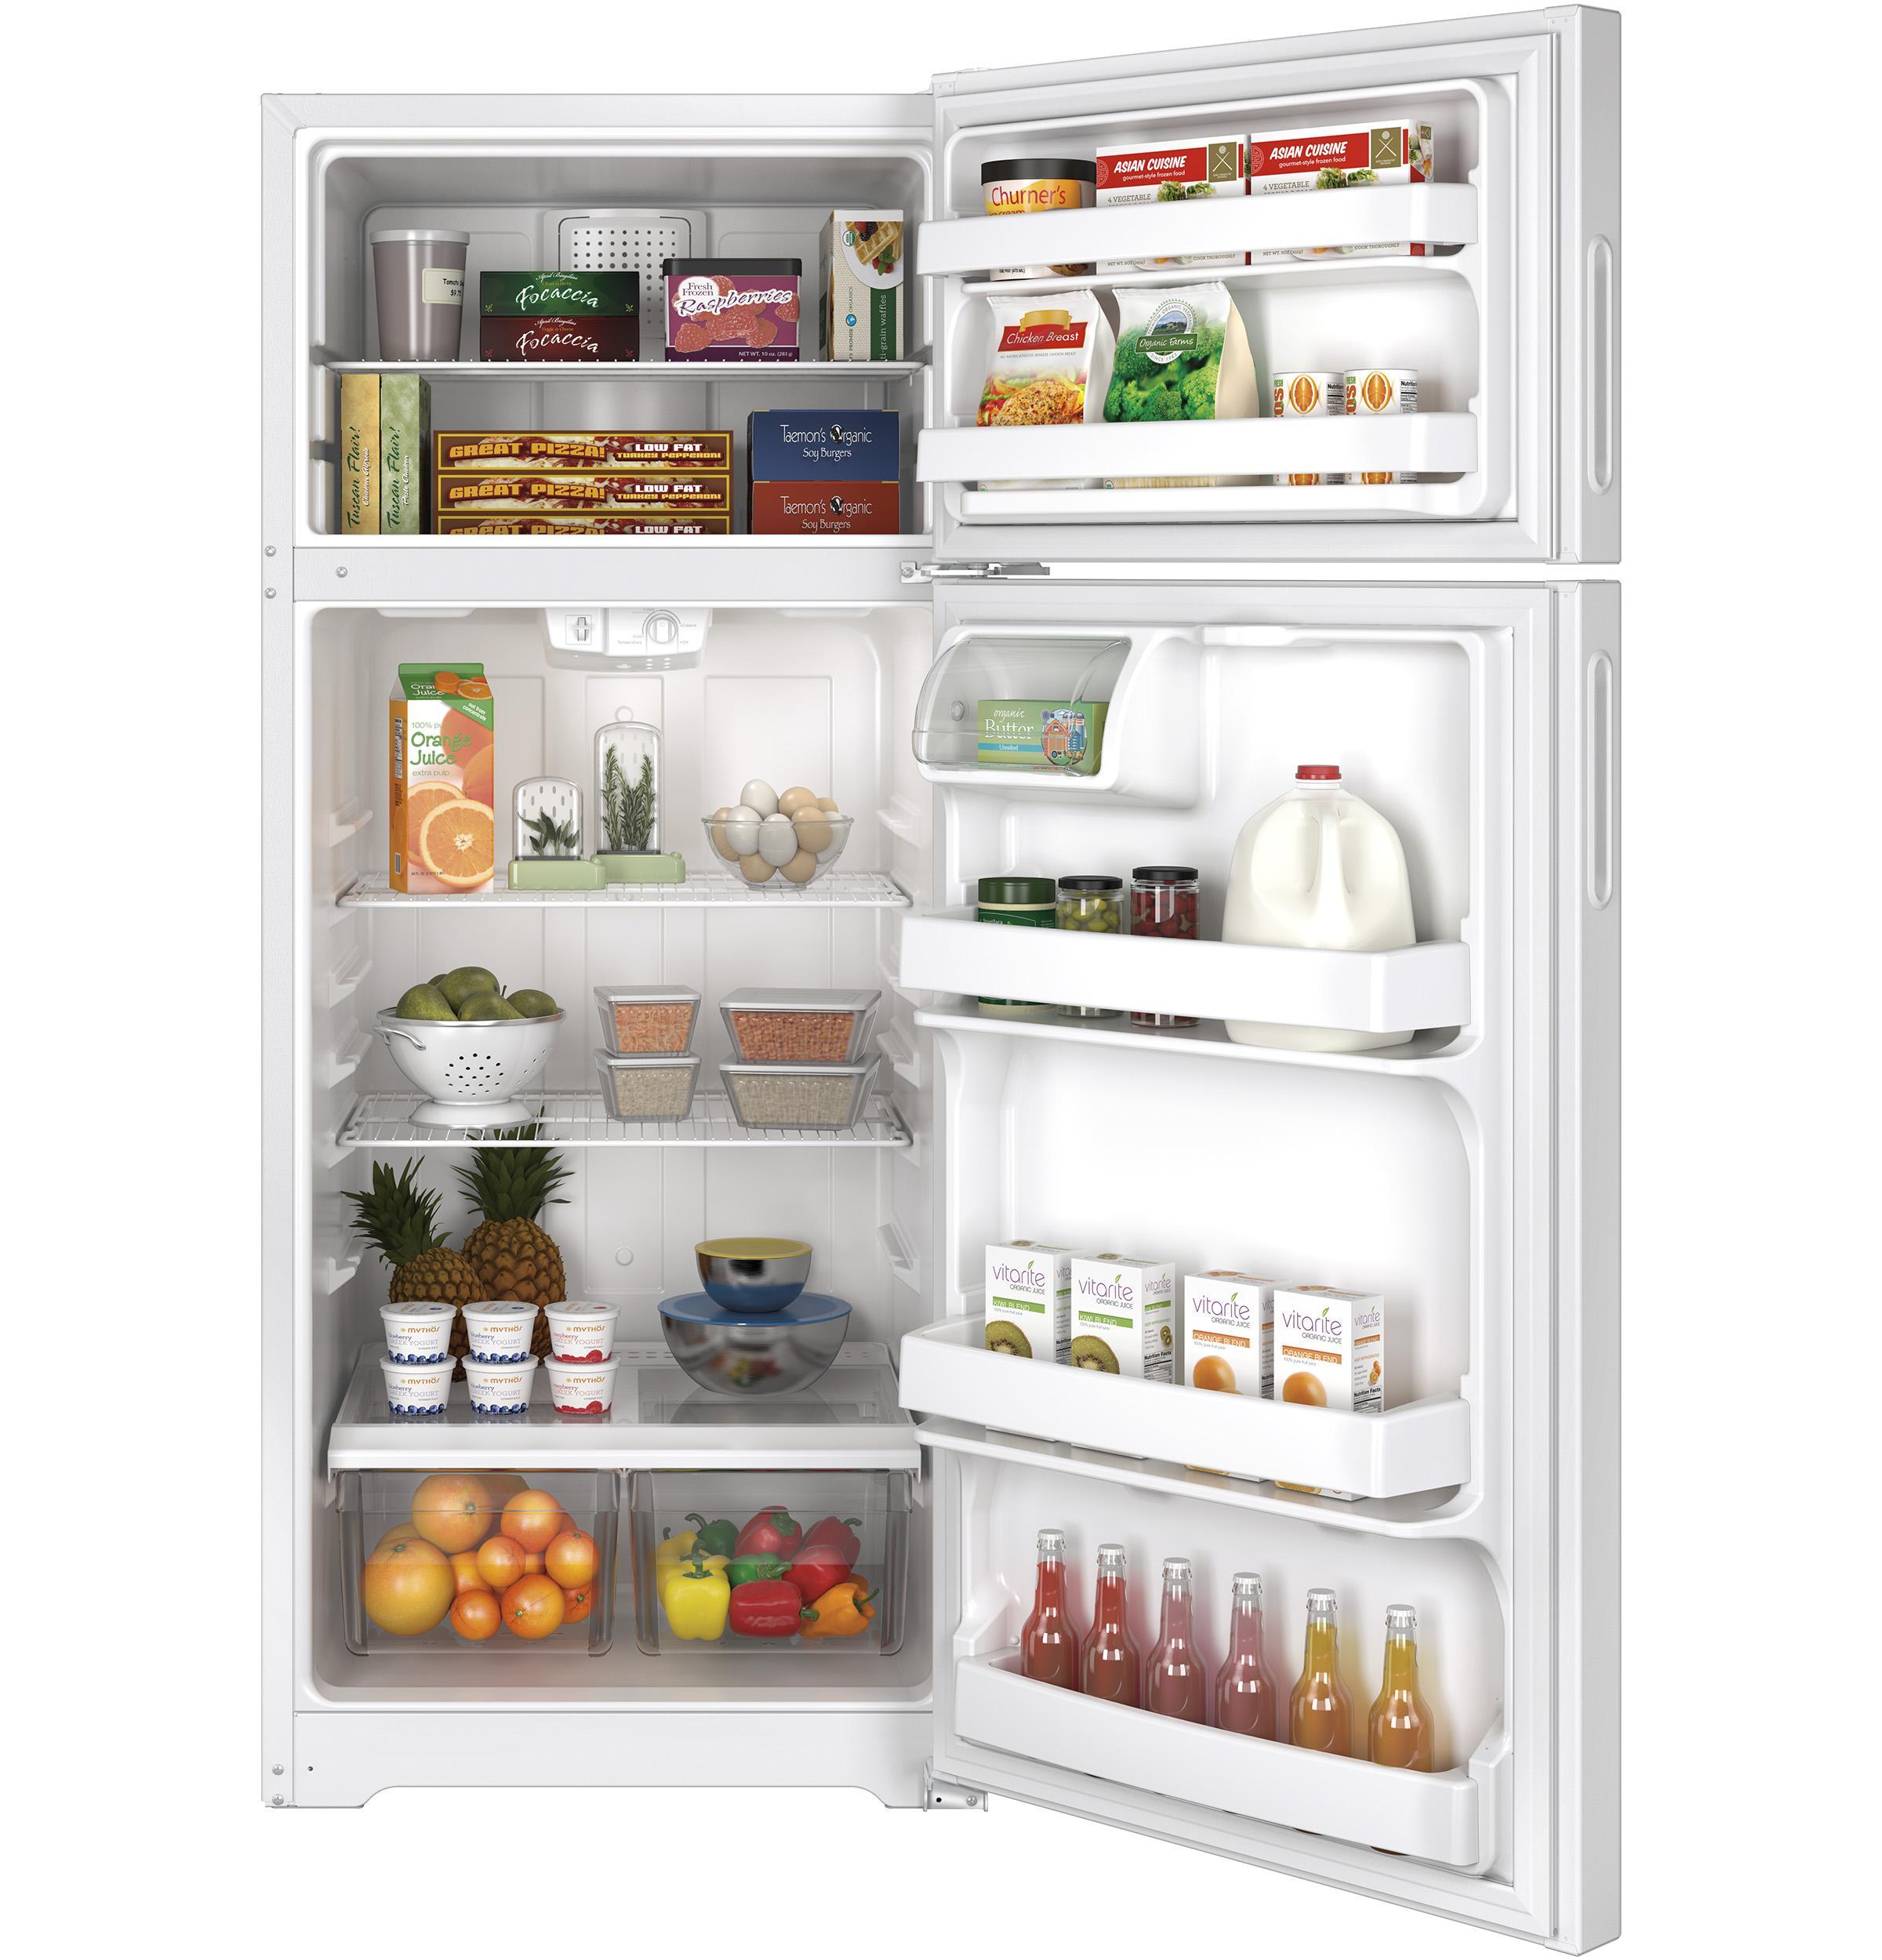 Hps18bth Hotpoint Hps18bth Top Freezer Refrigerators